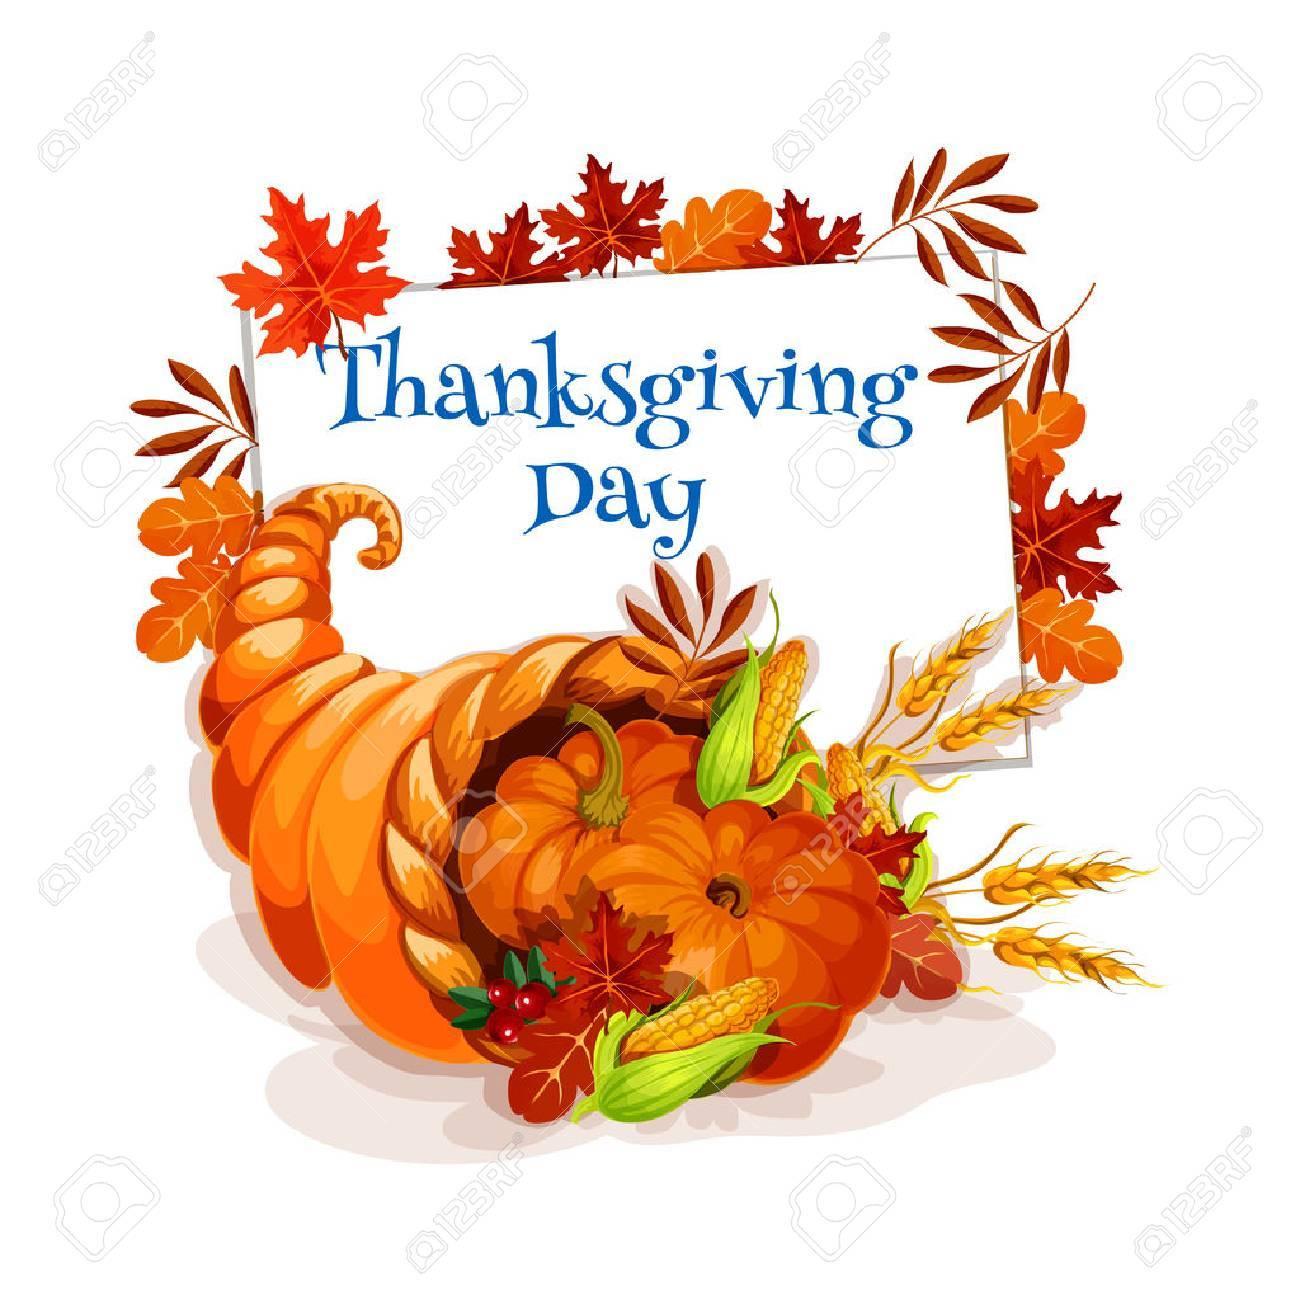 Thanksgiving Day Cornucopia Greeting Card Vector Design Template